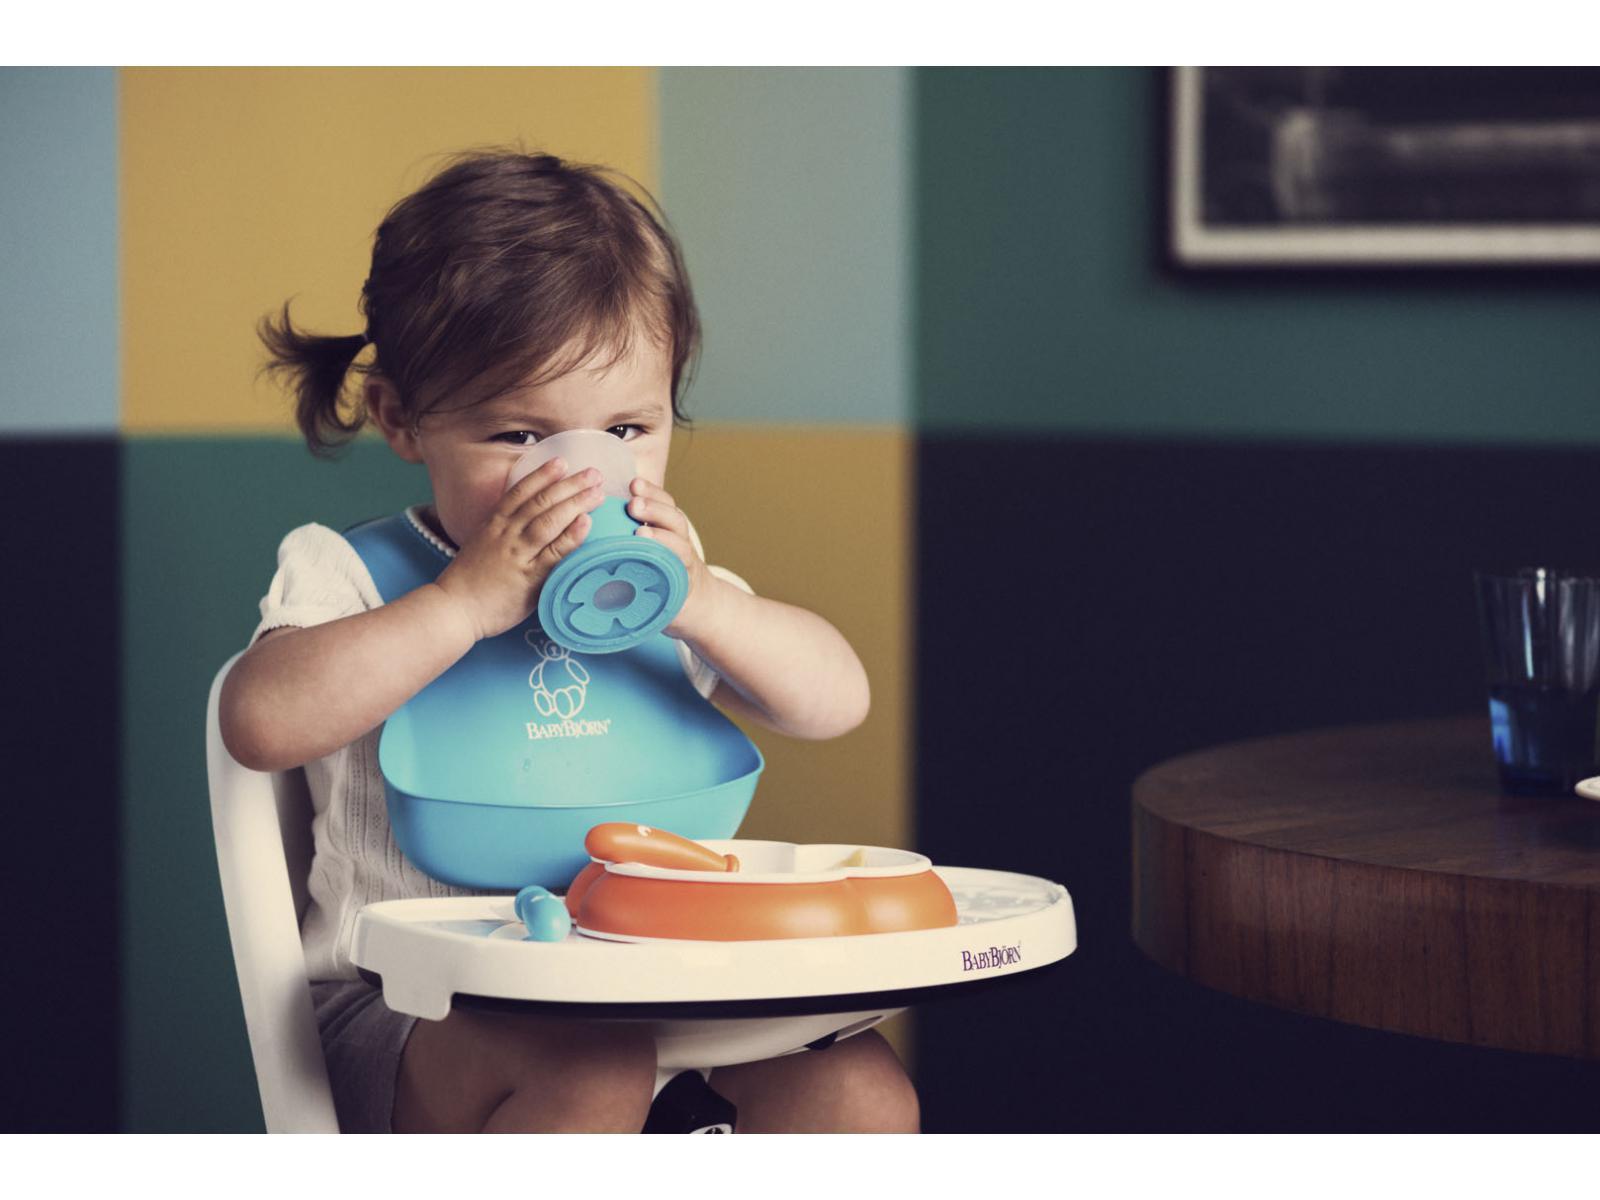 067085 Haute 067085 Chaise Babybjörn Turquoise LqSUzMVpG